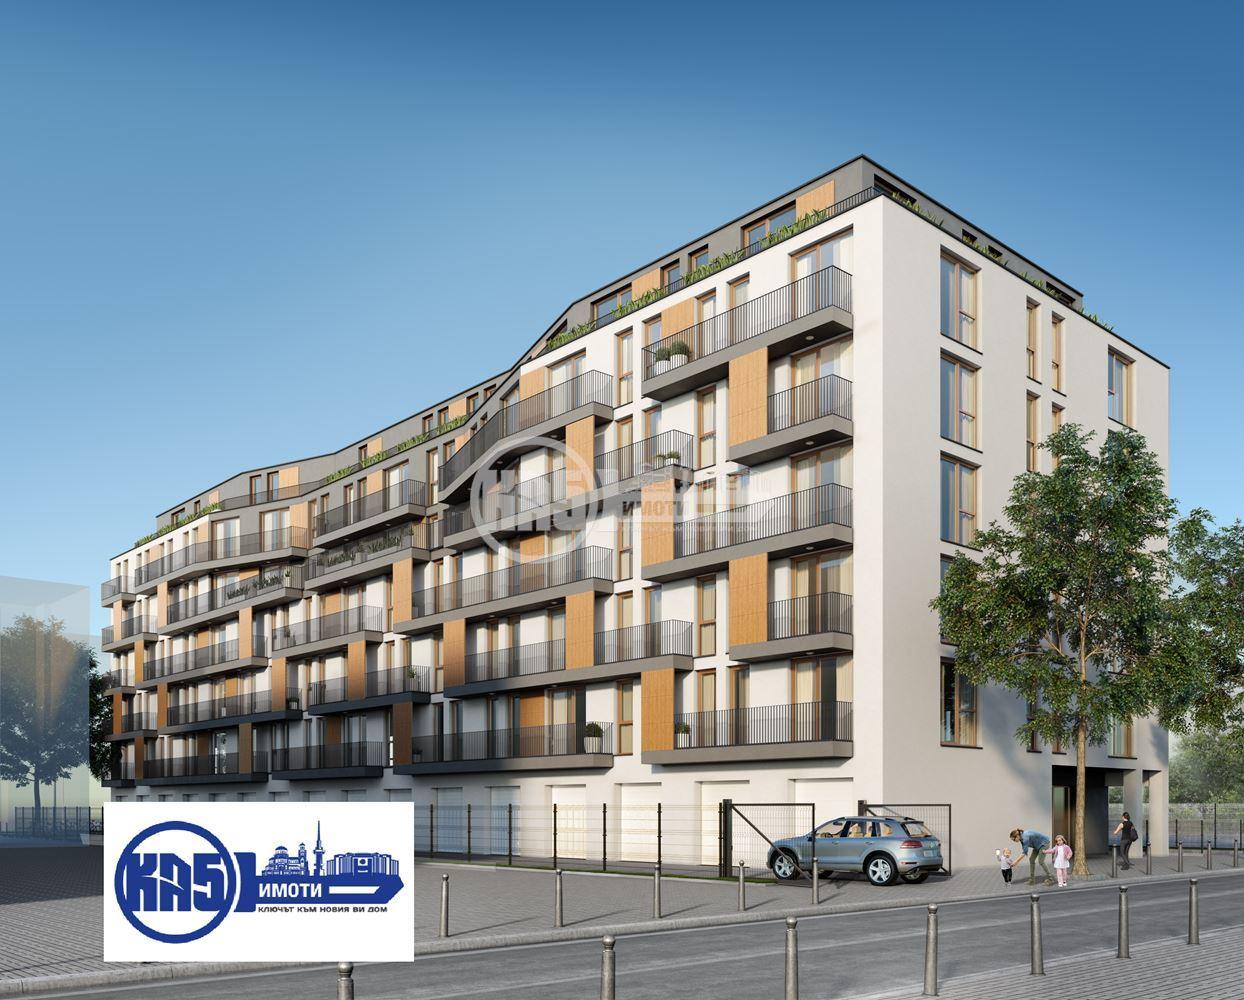 4 стаен апартамент ,АКТ 16-2020г.